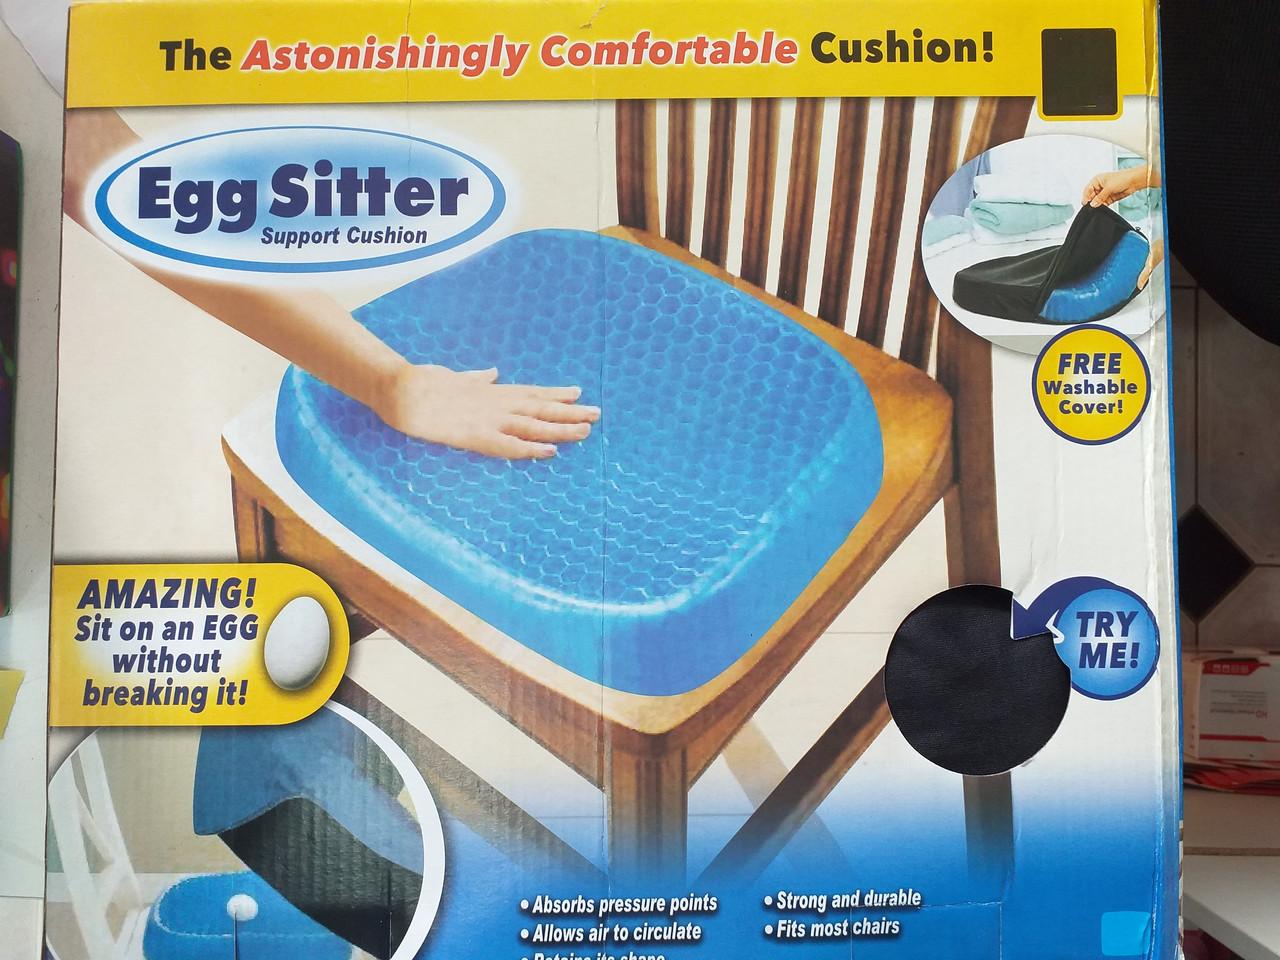 Ортопедическая седушка egg sitter 600g